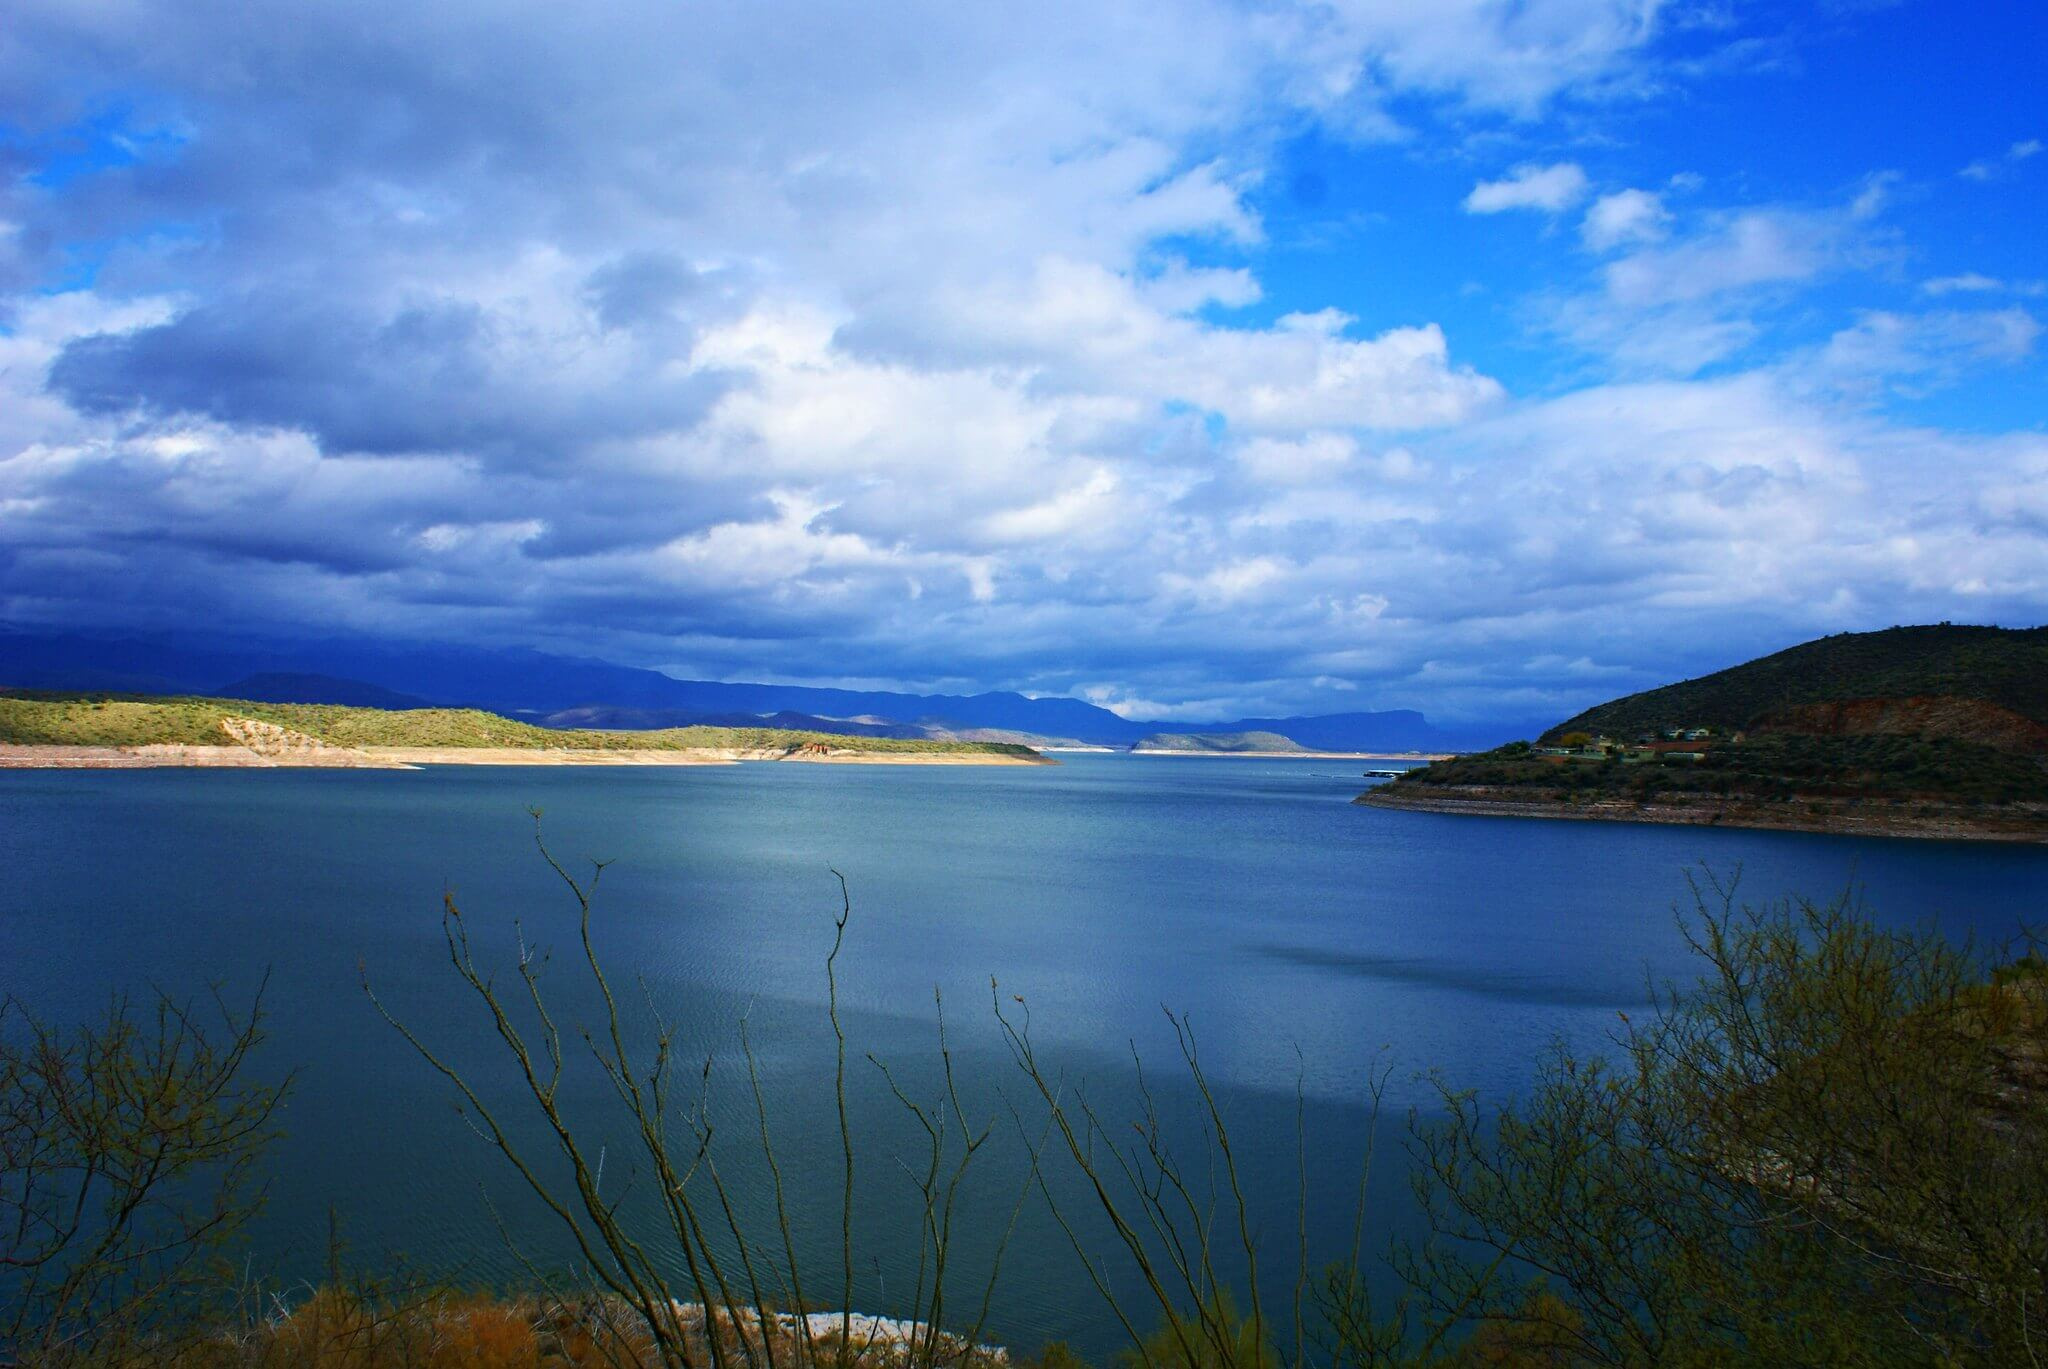 Number 5 - Roosevelt Lake for Fishing in Arizona